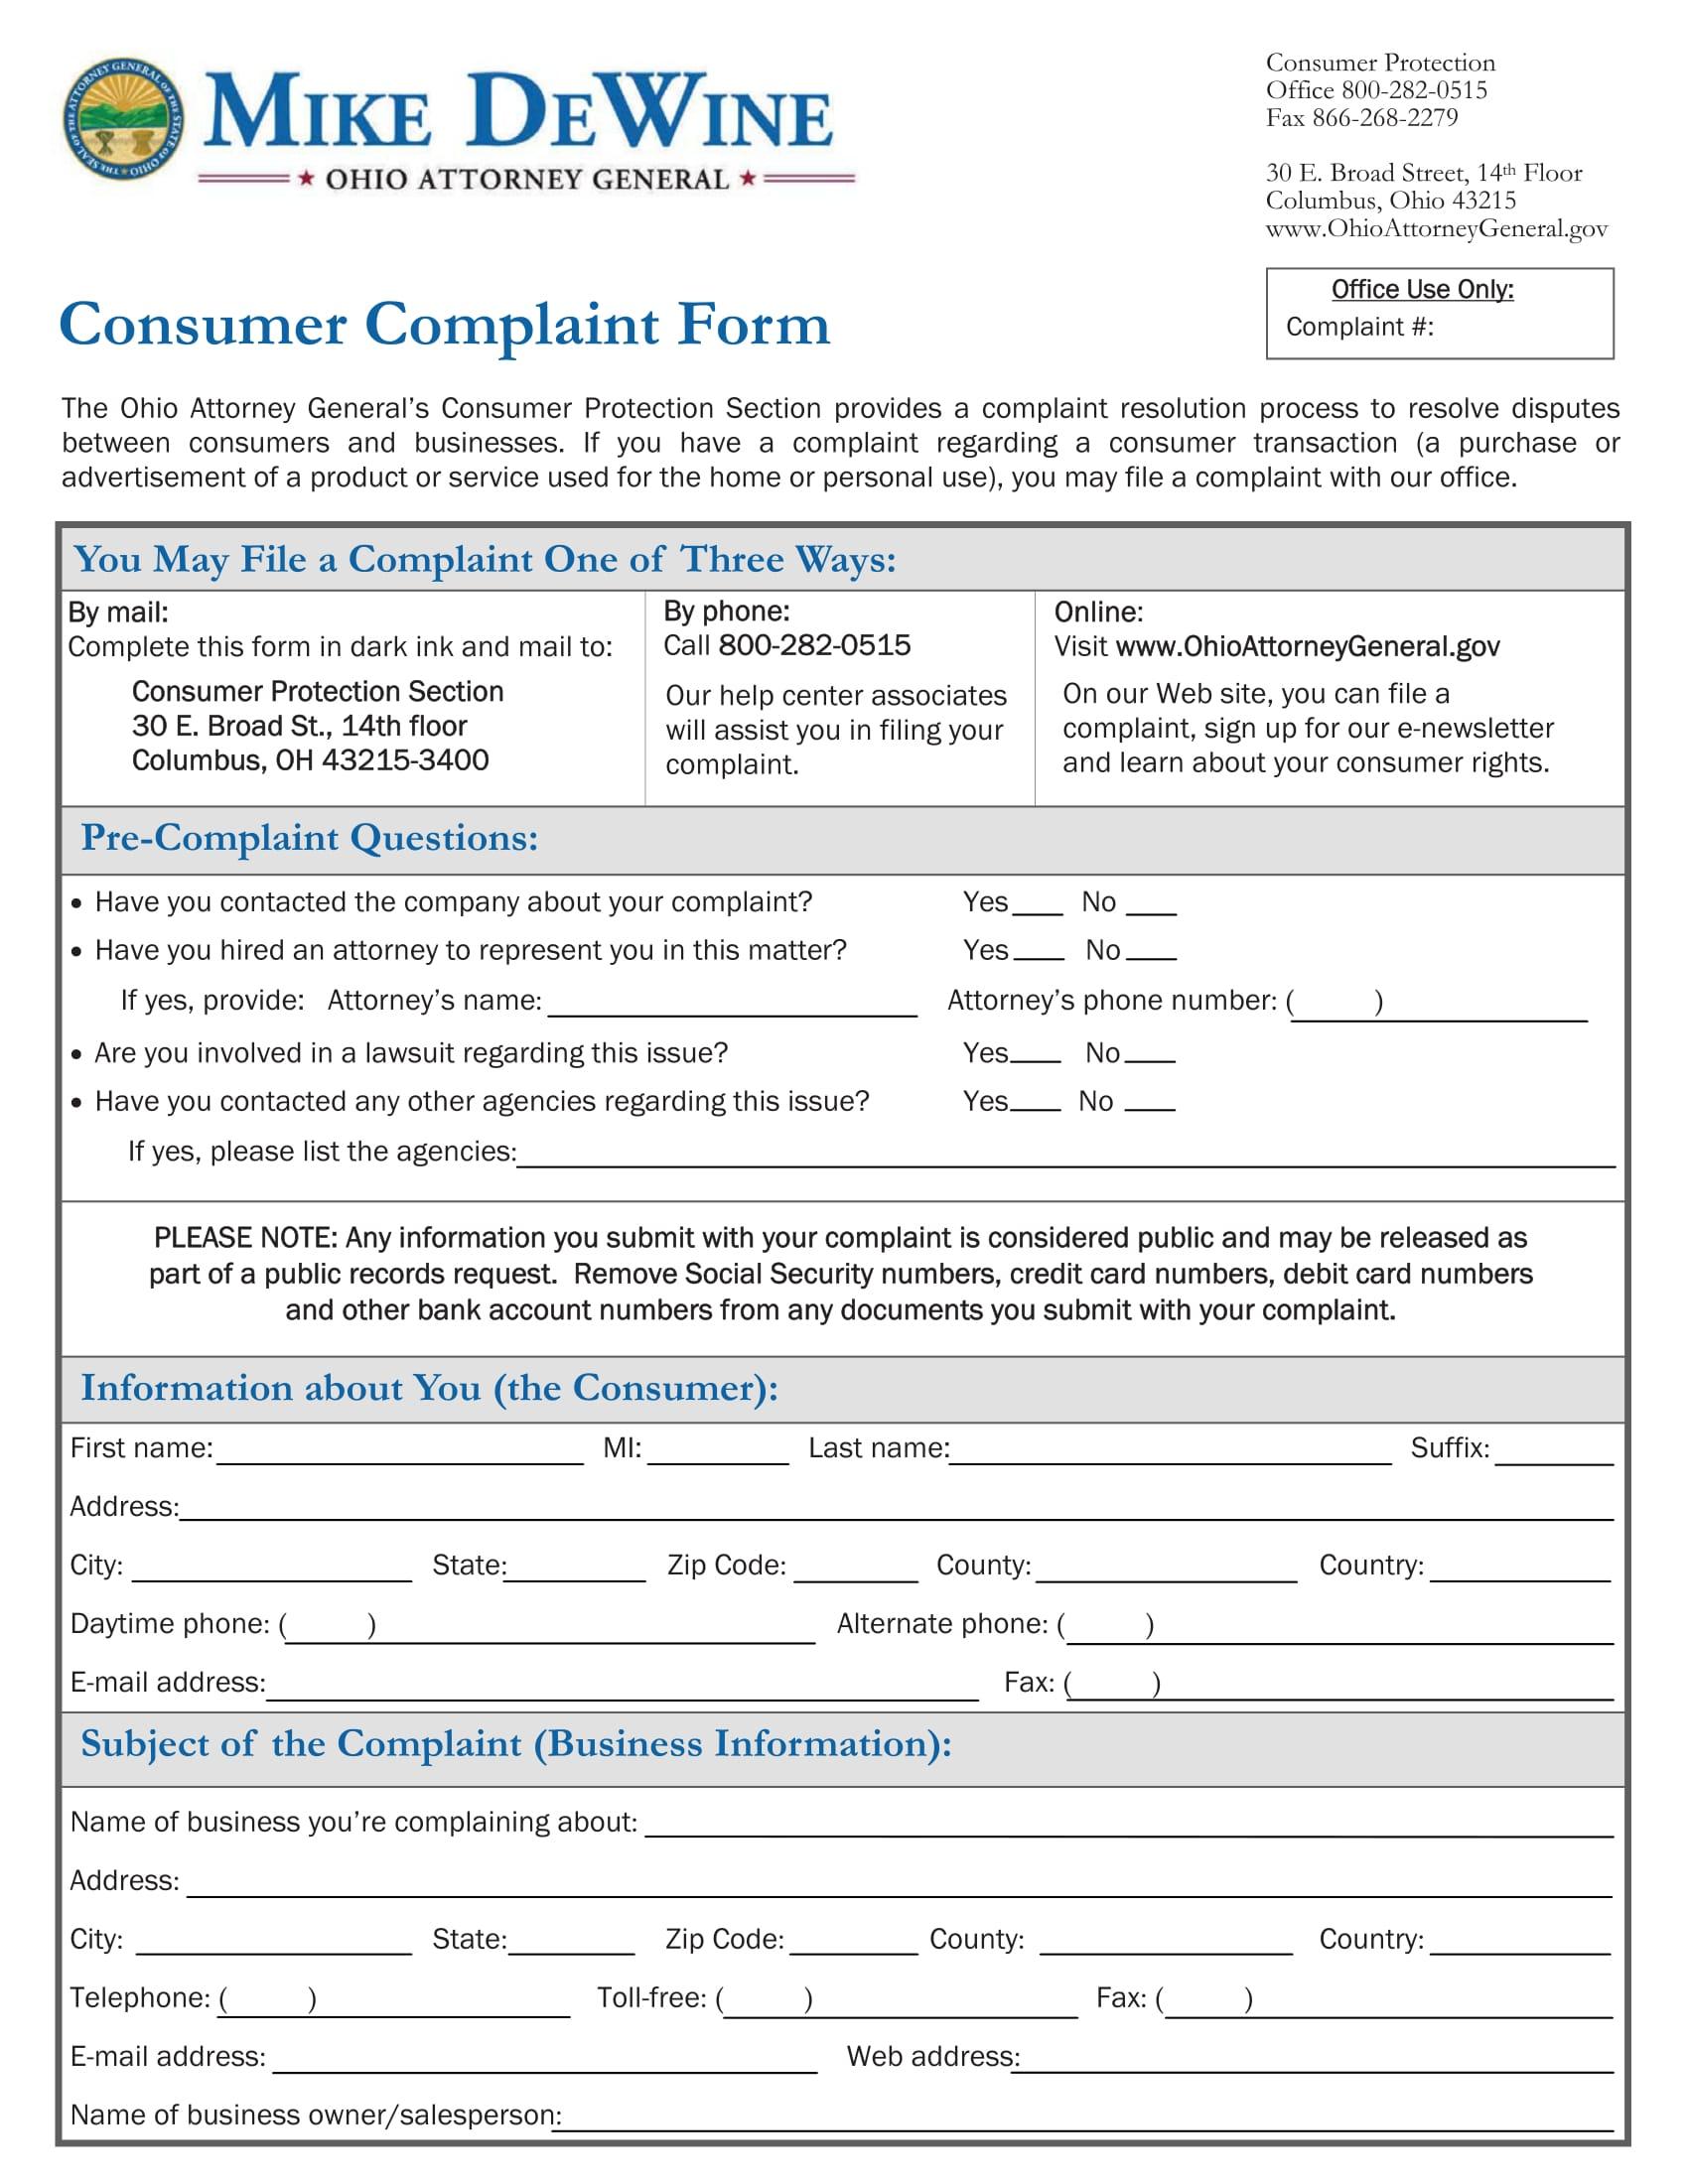 100 Financial Ombudsman Service Complaint Form – Financial Ombudsman Service Complaint Form